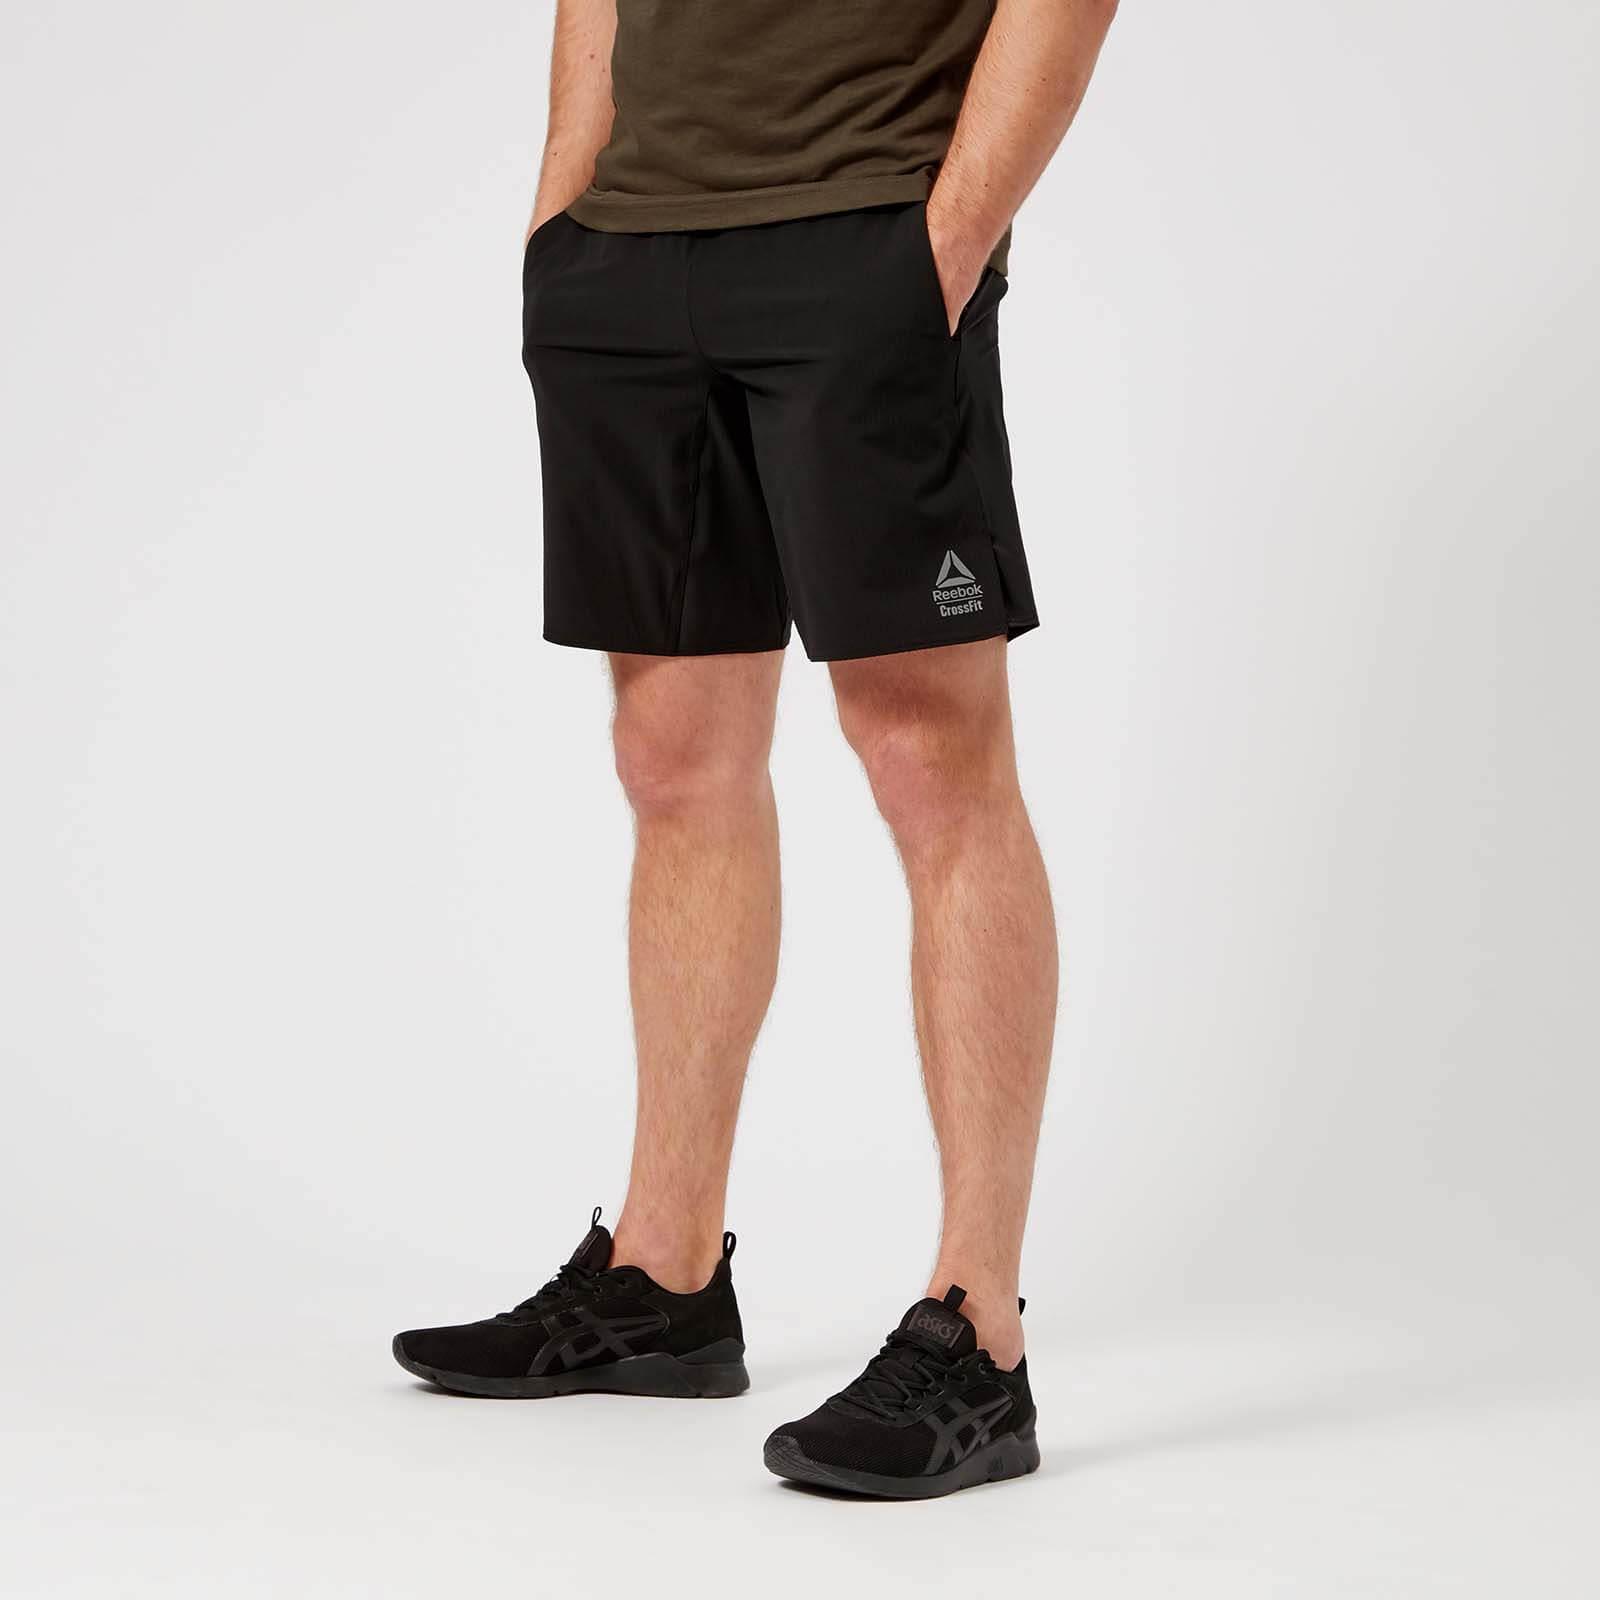 0c8ab59d28b8 Reebok Men s CrossFit Speed Pro Shorts - Black Sports   Leisure ...